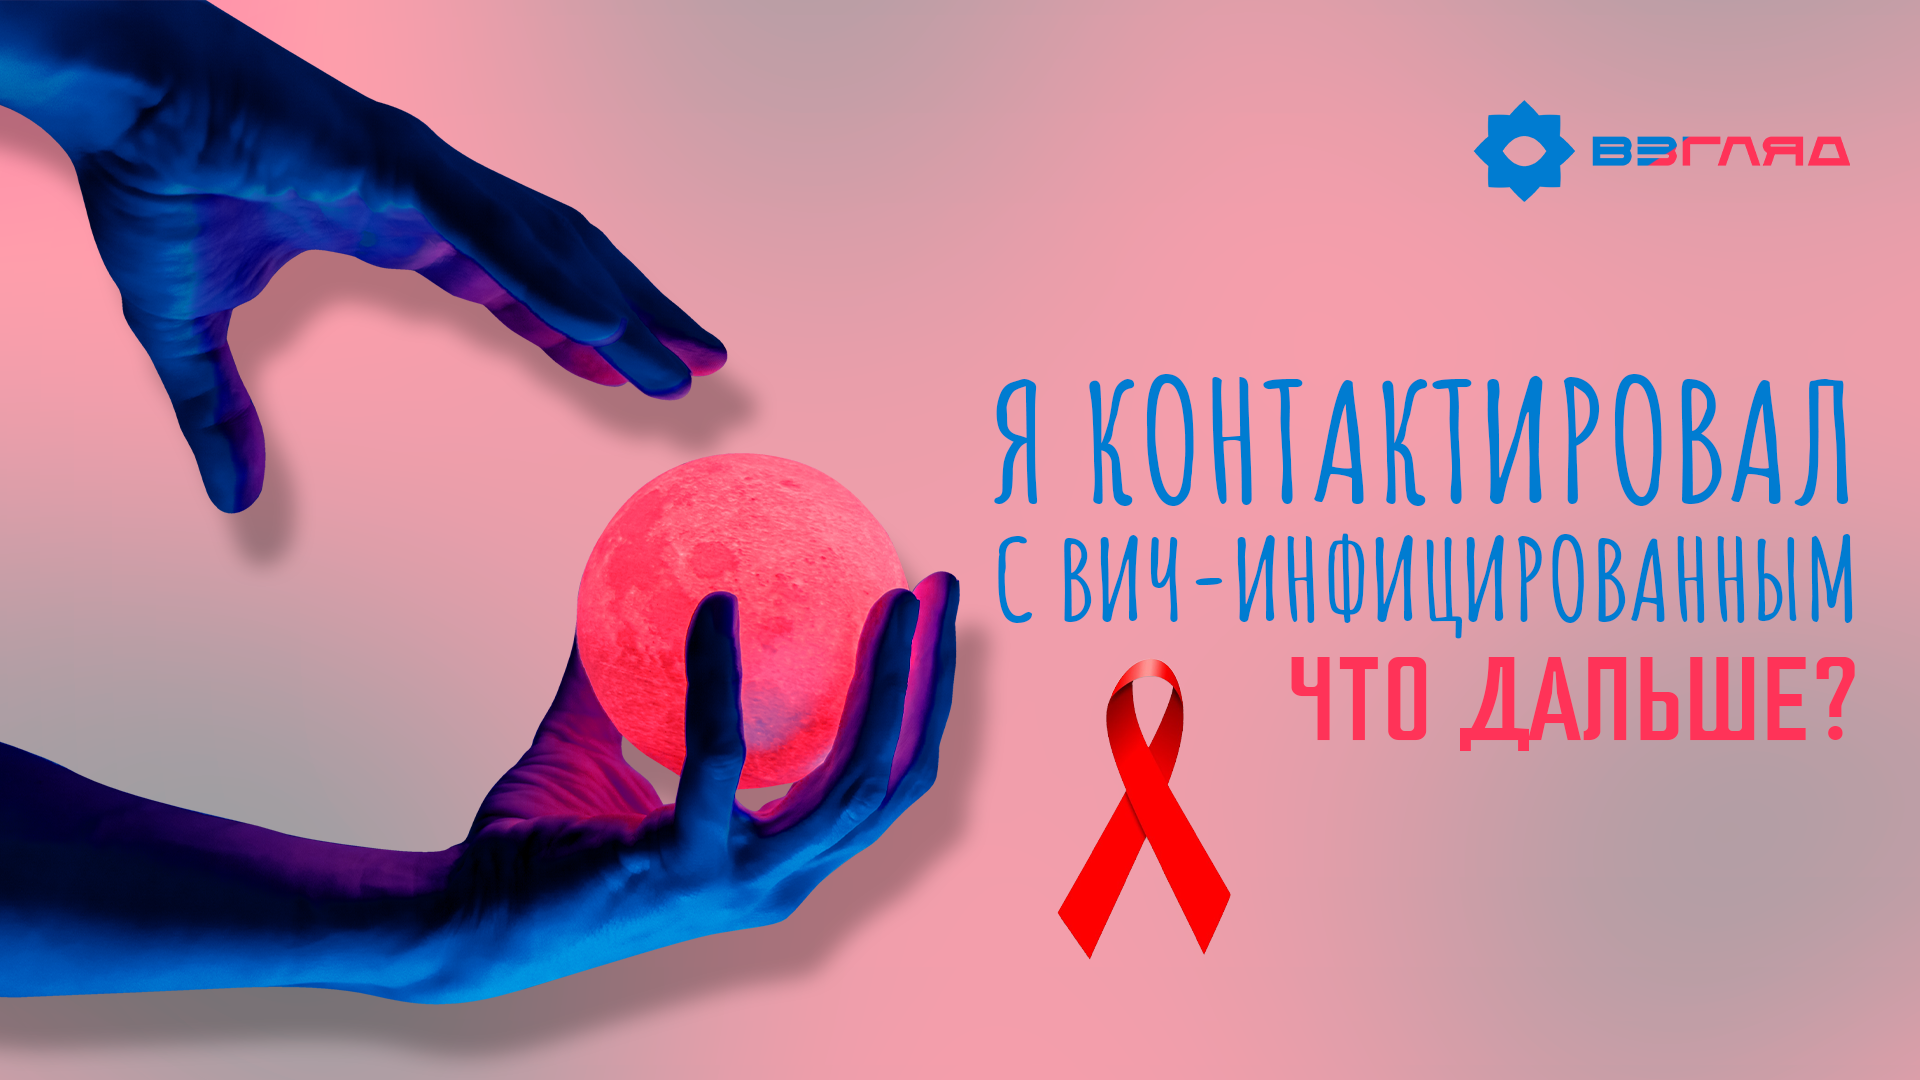 Как обезопасить себя от ВИЧ-инфекции